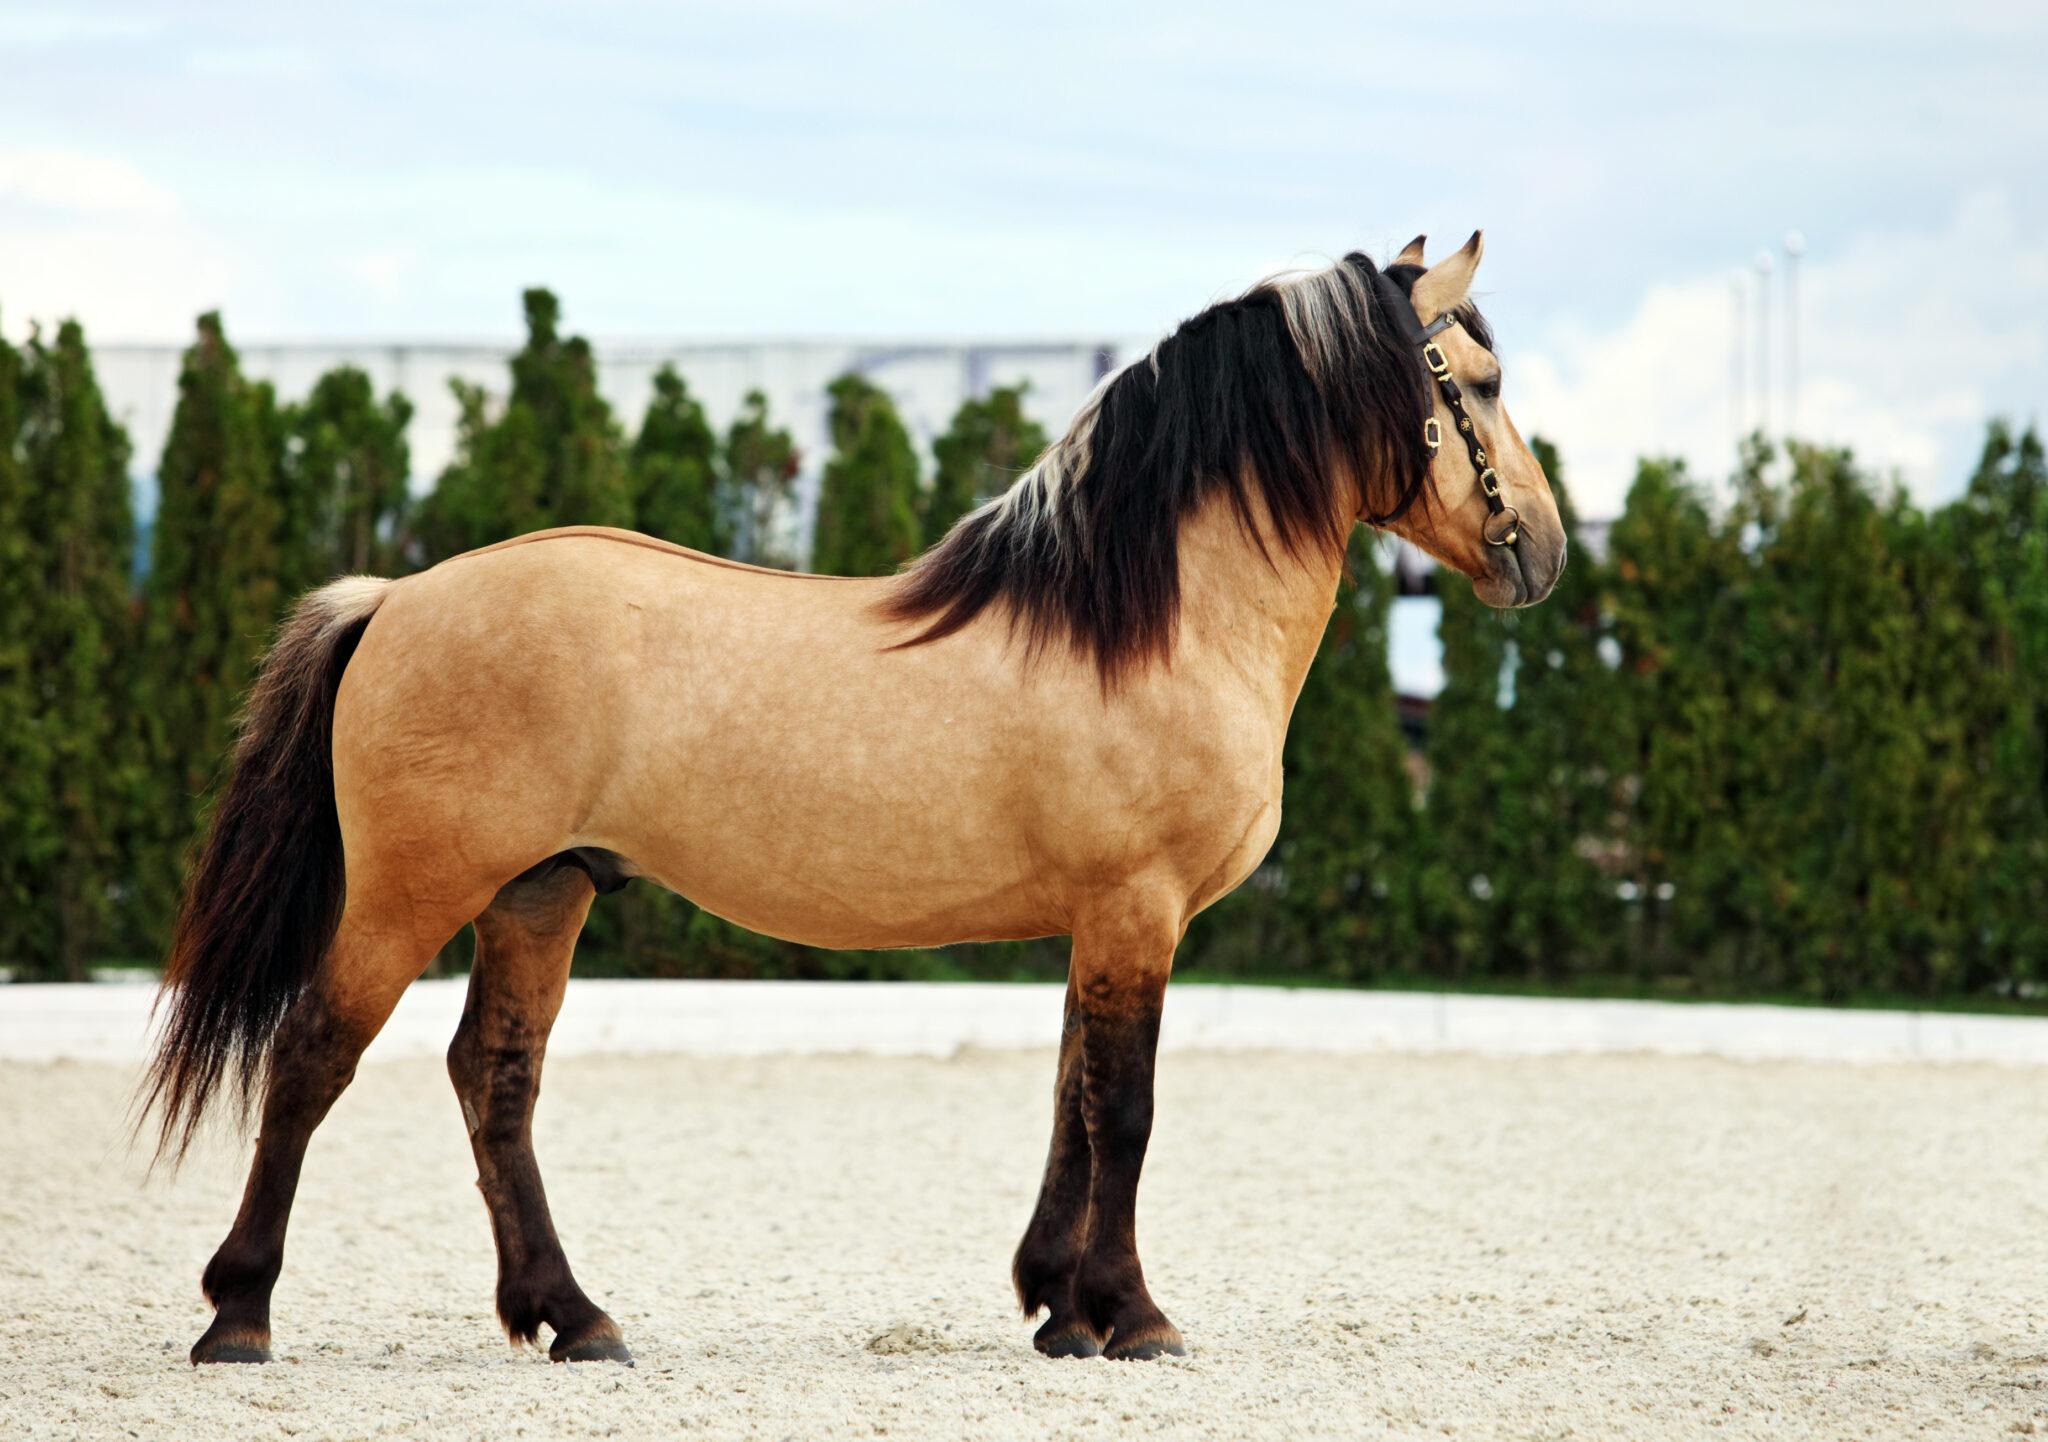 Horse Breed: Paso Fino - photo via horsemen/Shutterstock.com - Globetrotting horse riding holidays